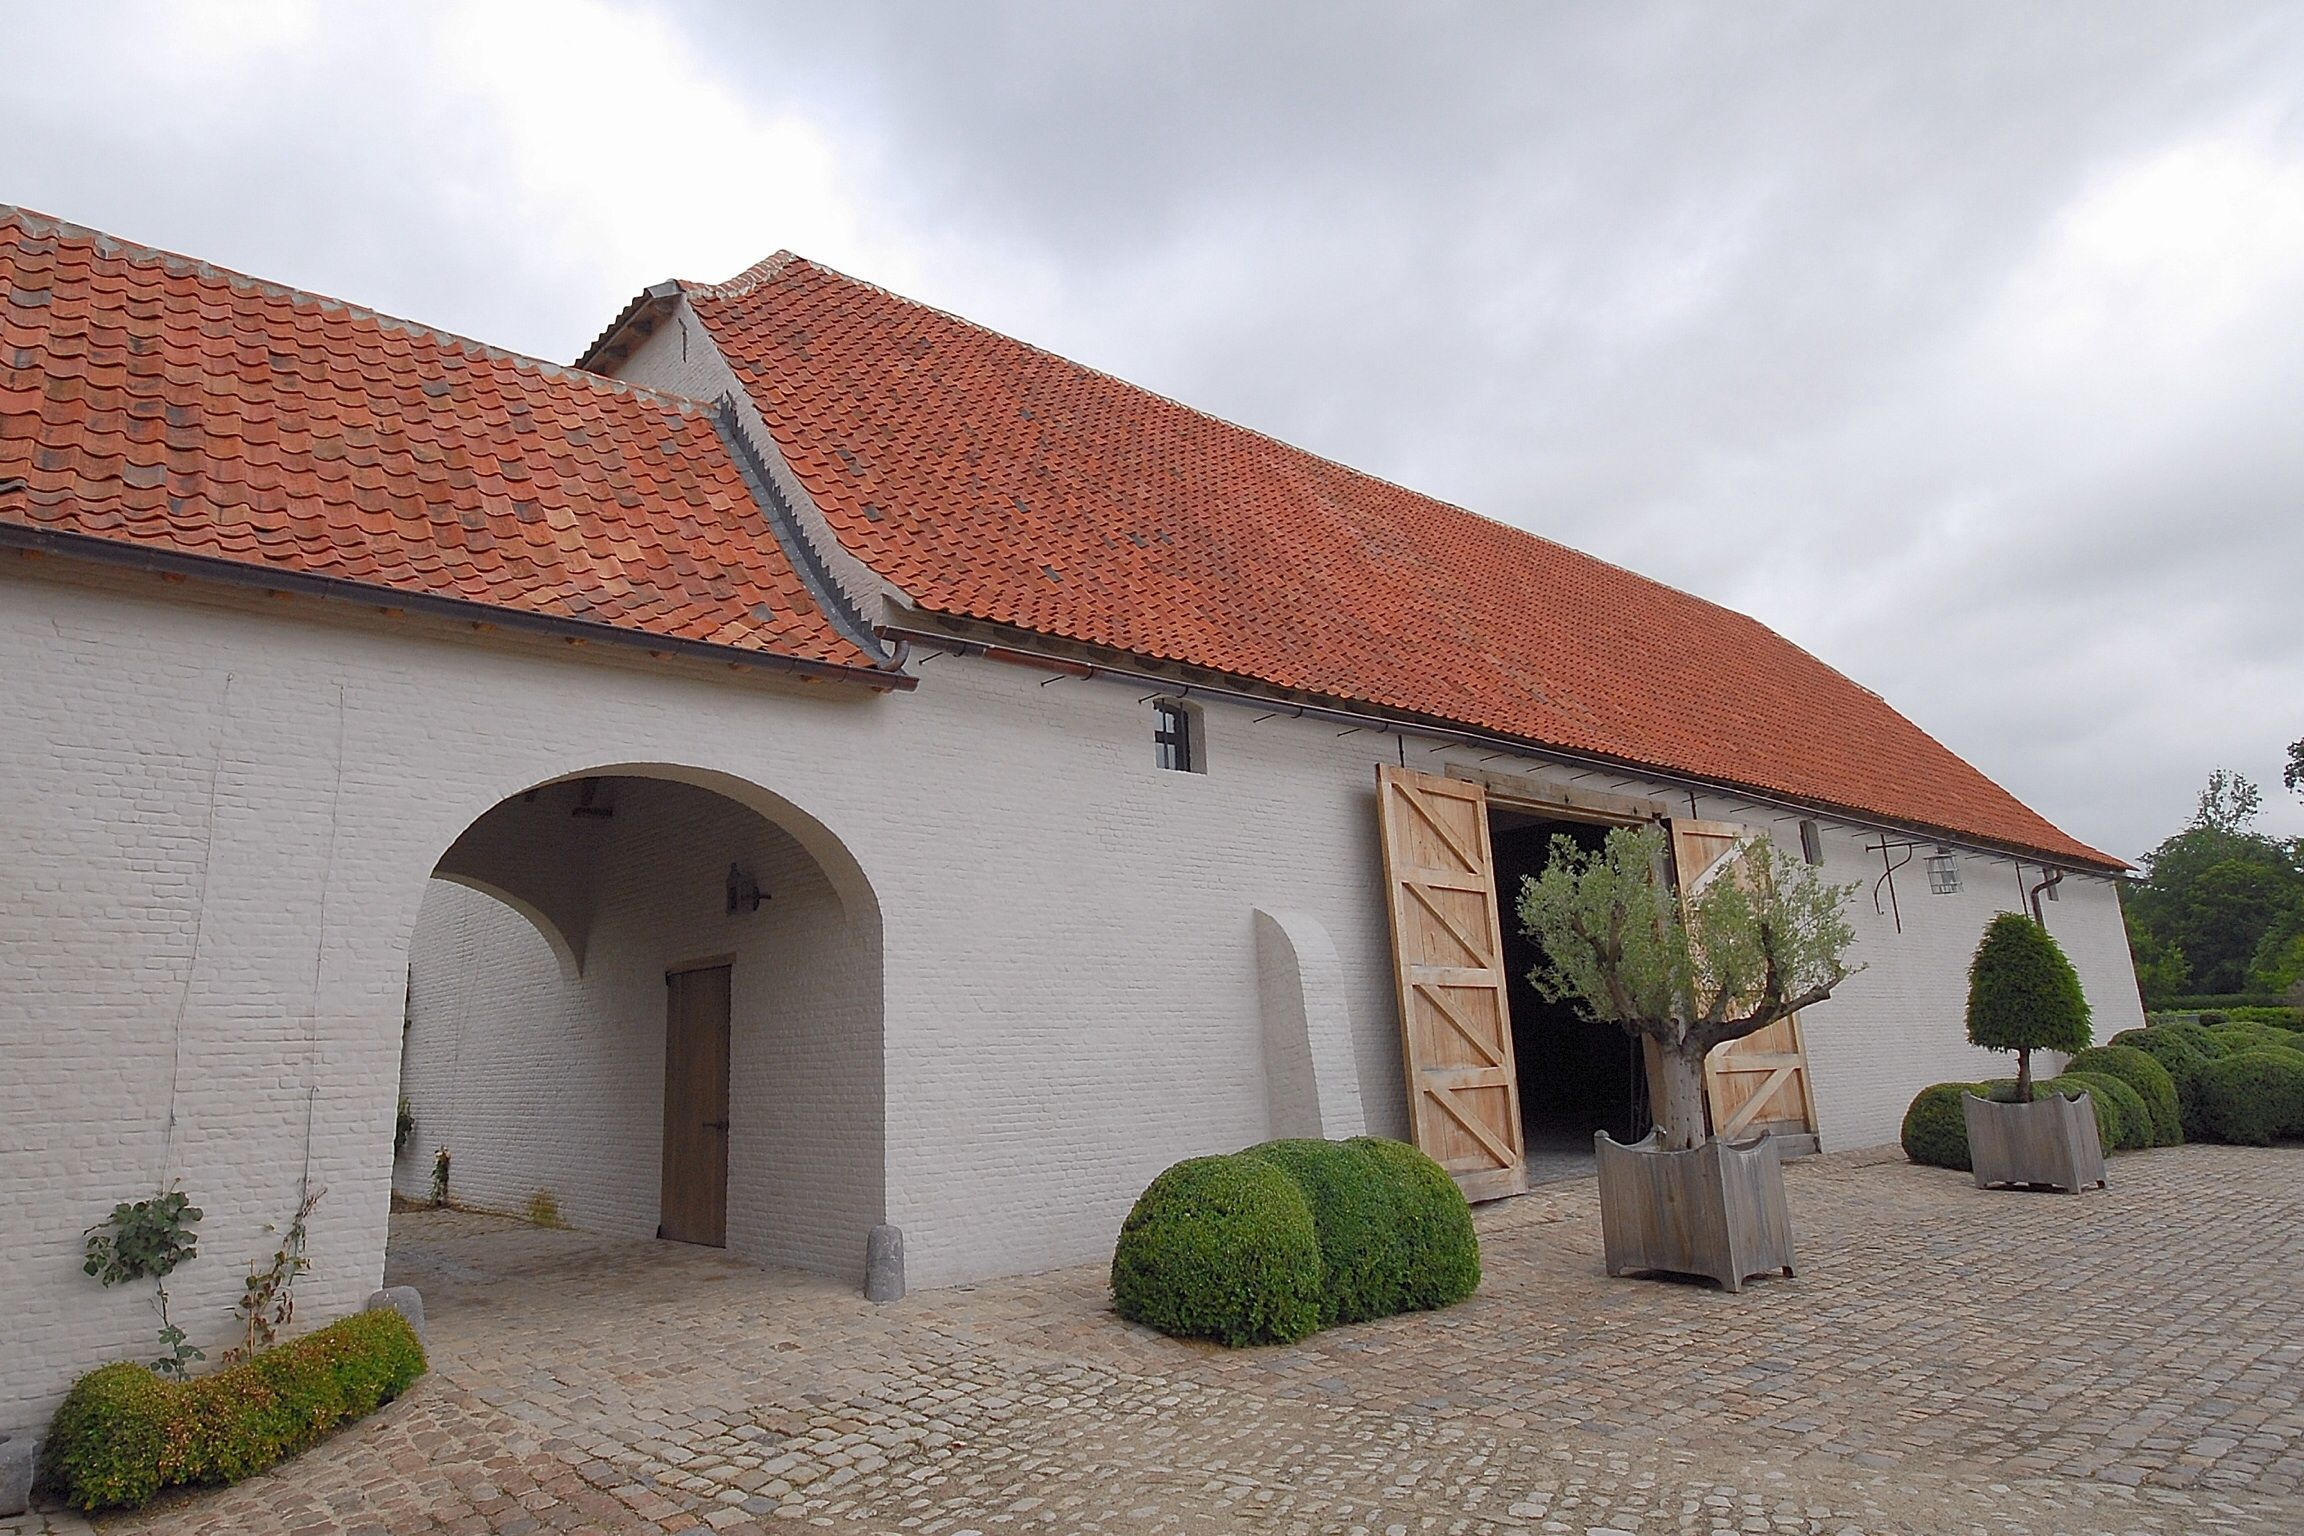 Kalei villa huizen idee n pinterest house home en for Huizen ideeen